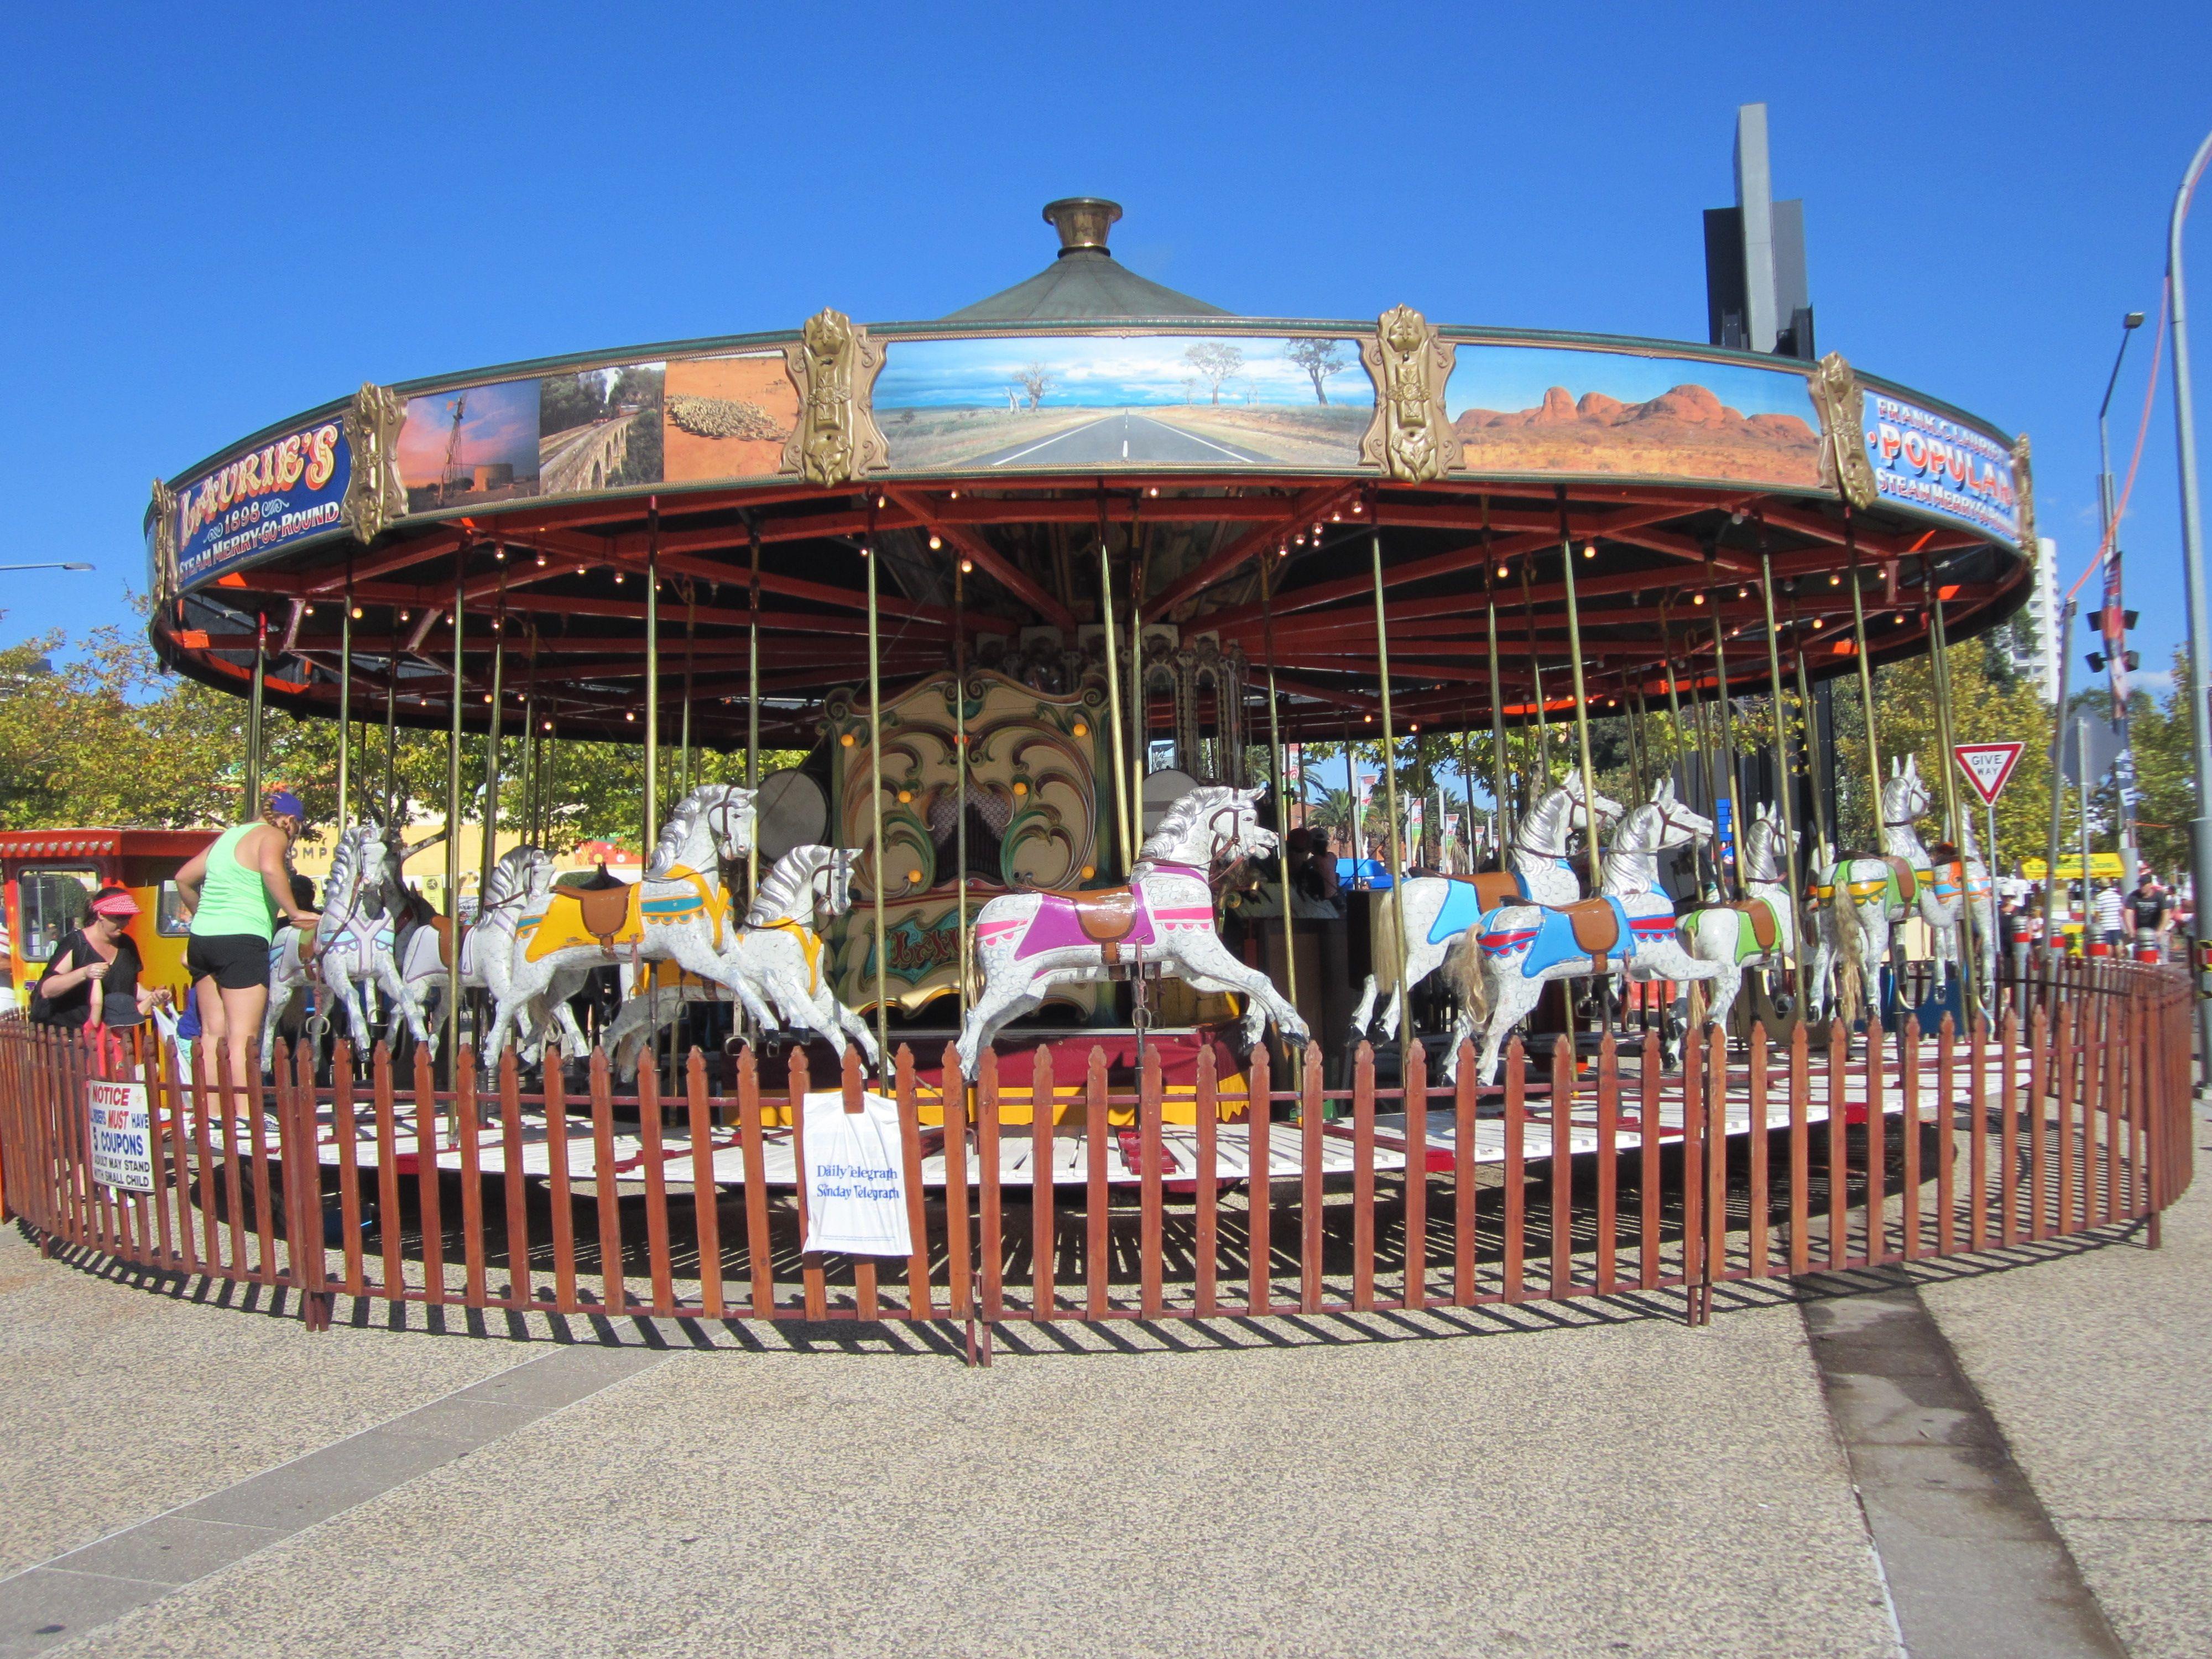 the classic steam merry go round kids rides fun love summer